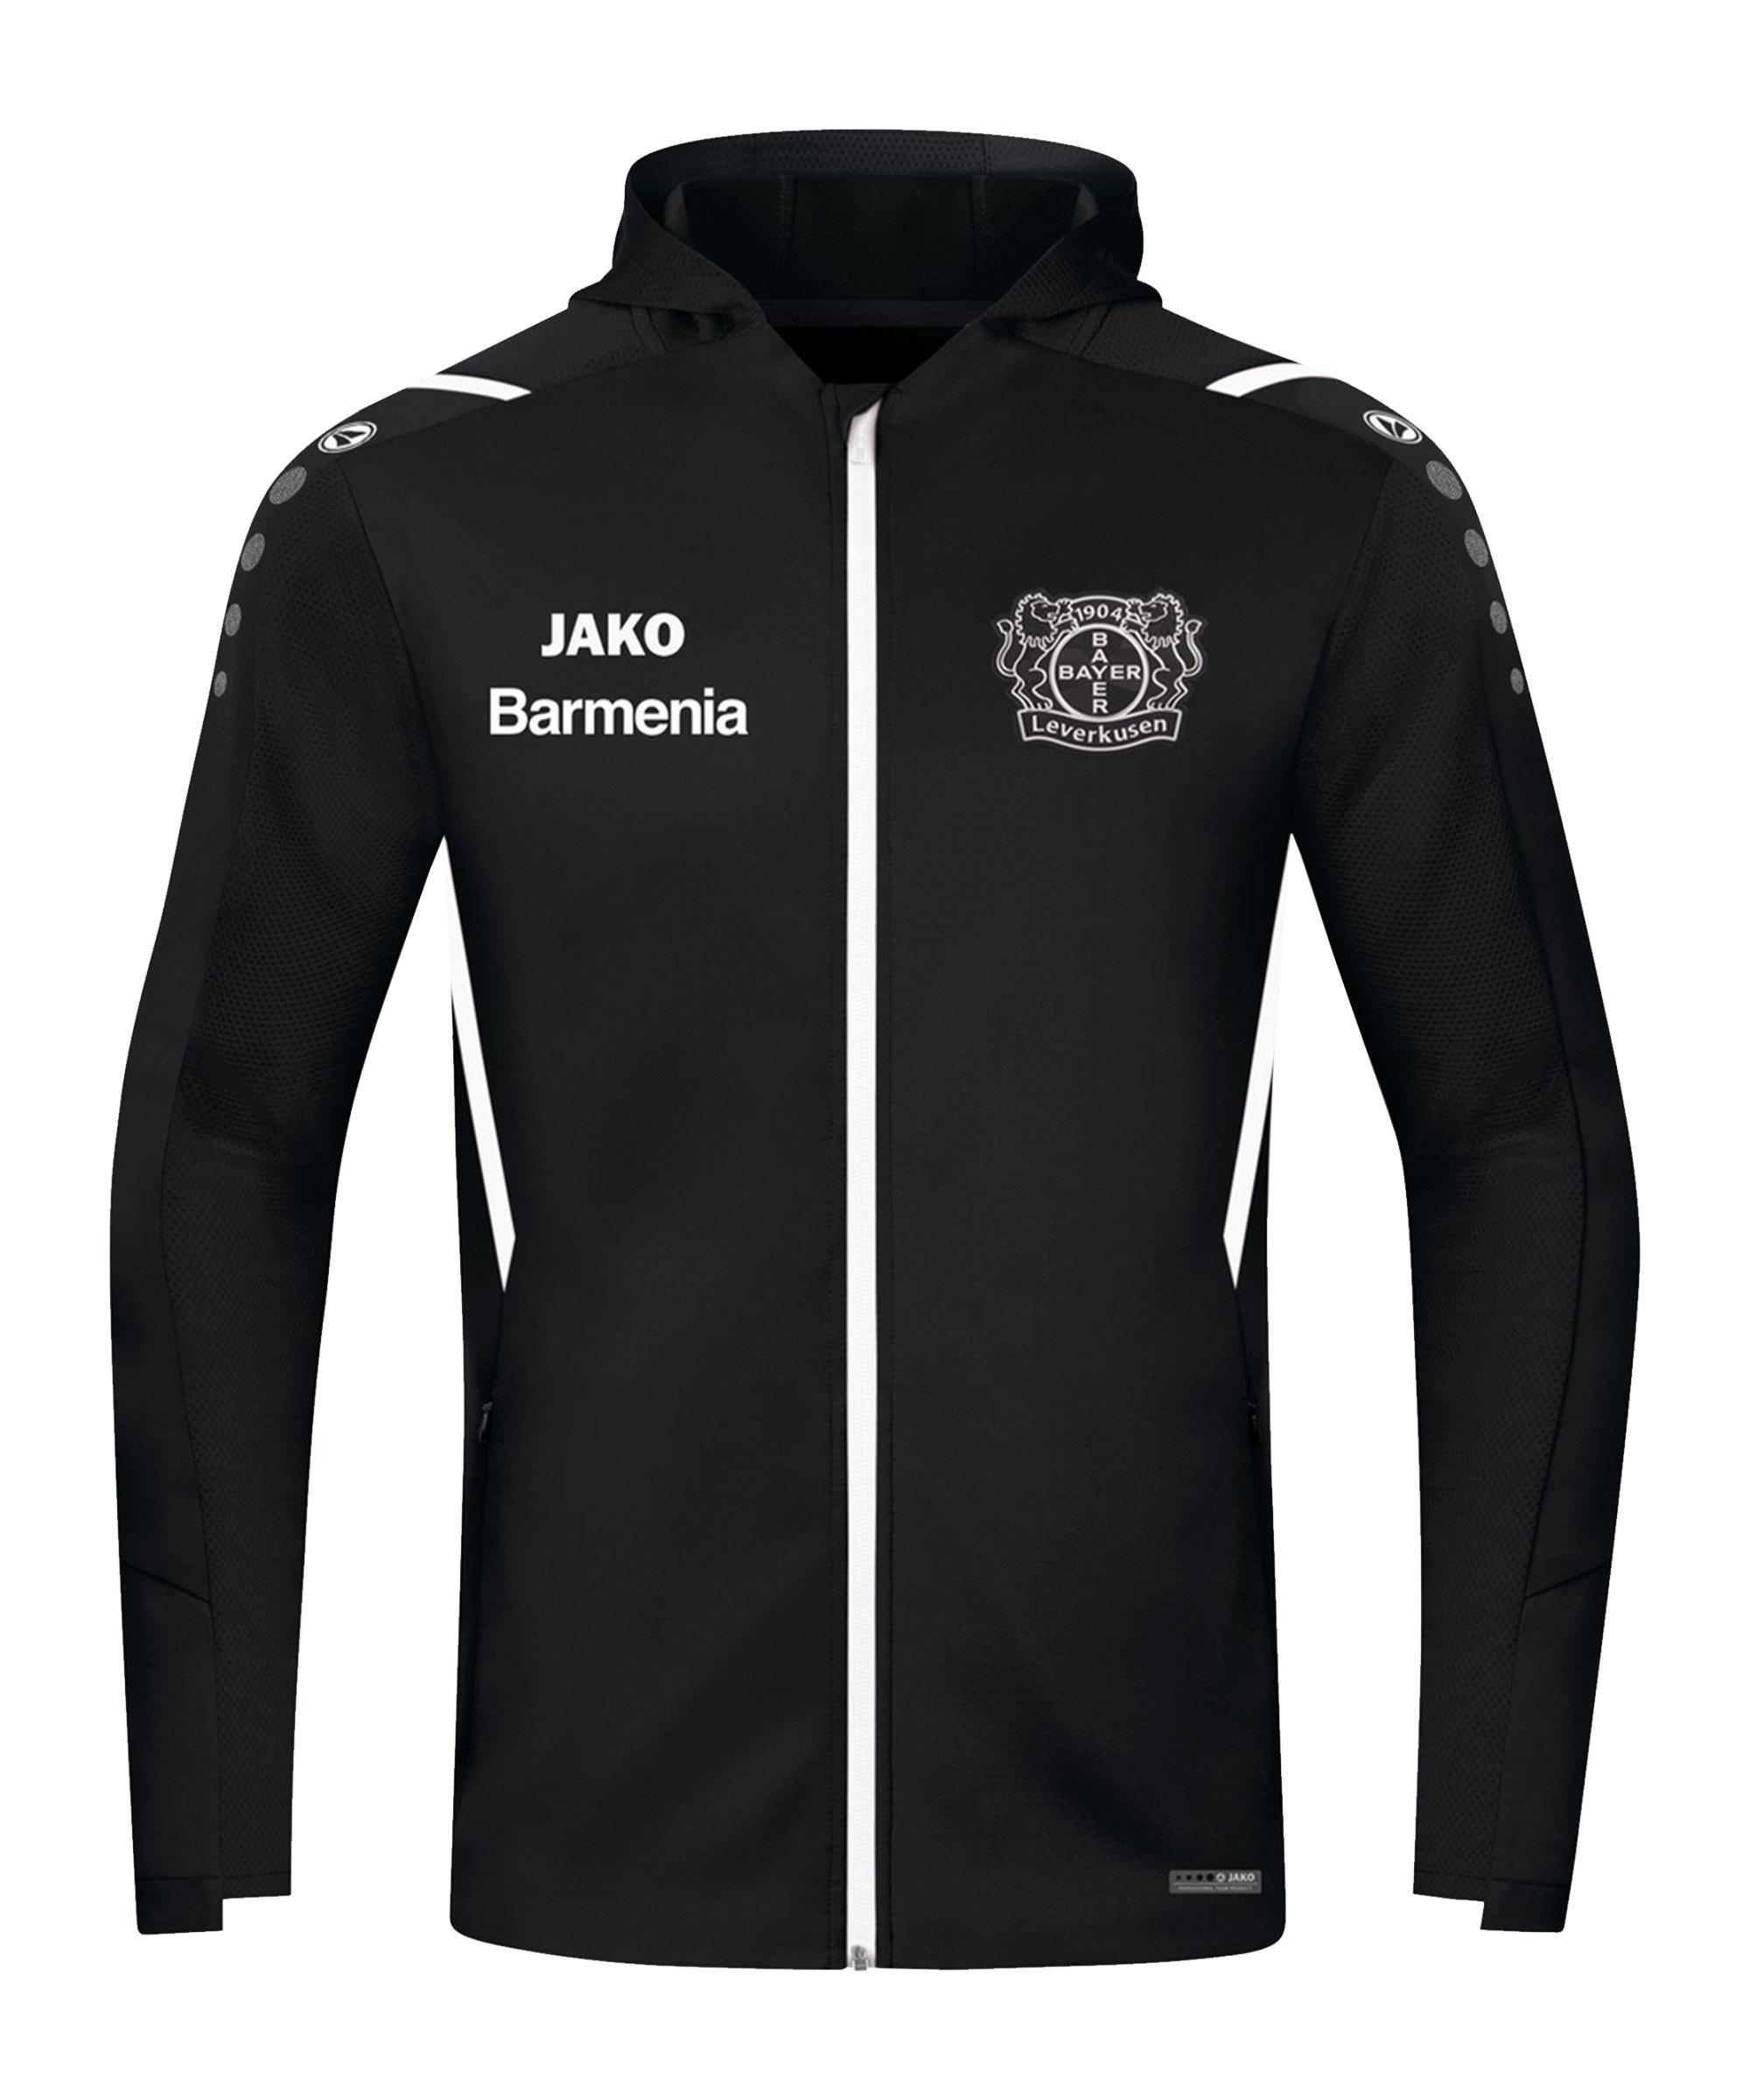 JAKO Bayer 04 Leverkusen Challenge Trainingsjacke Kids Schwarz Weiss F802 - schwarz